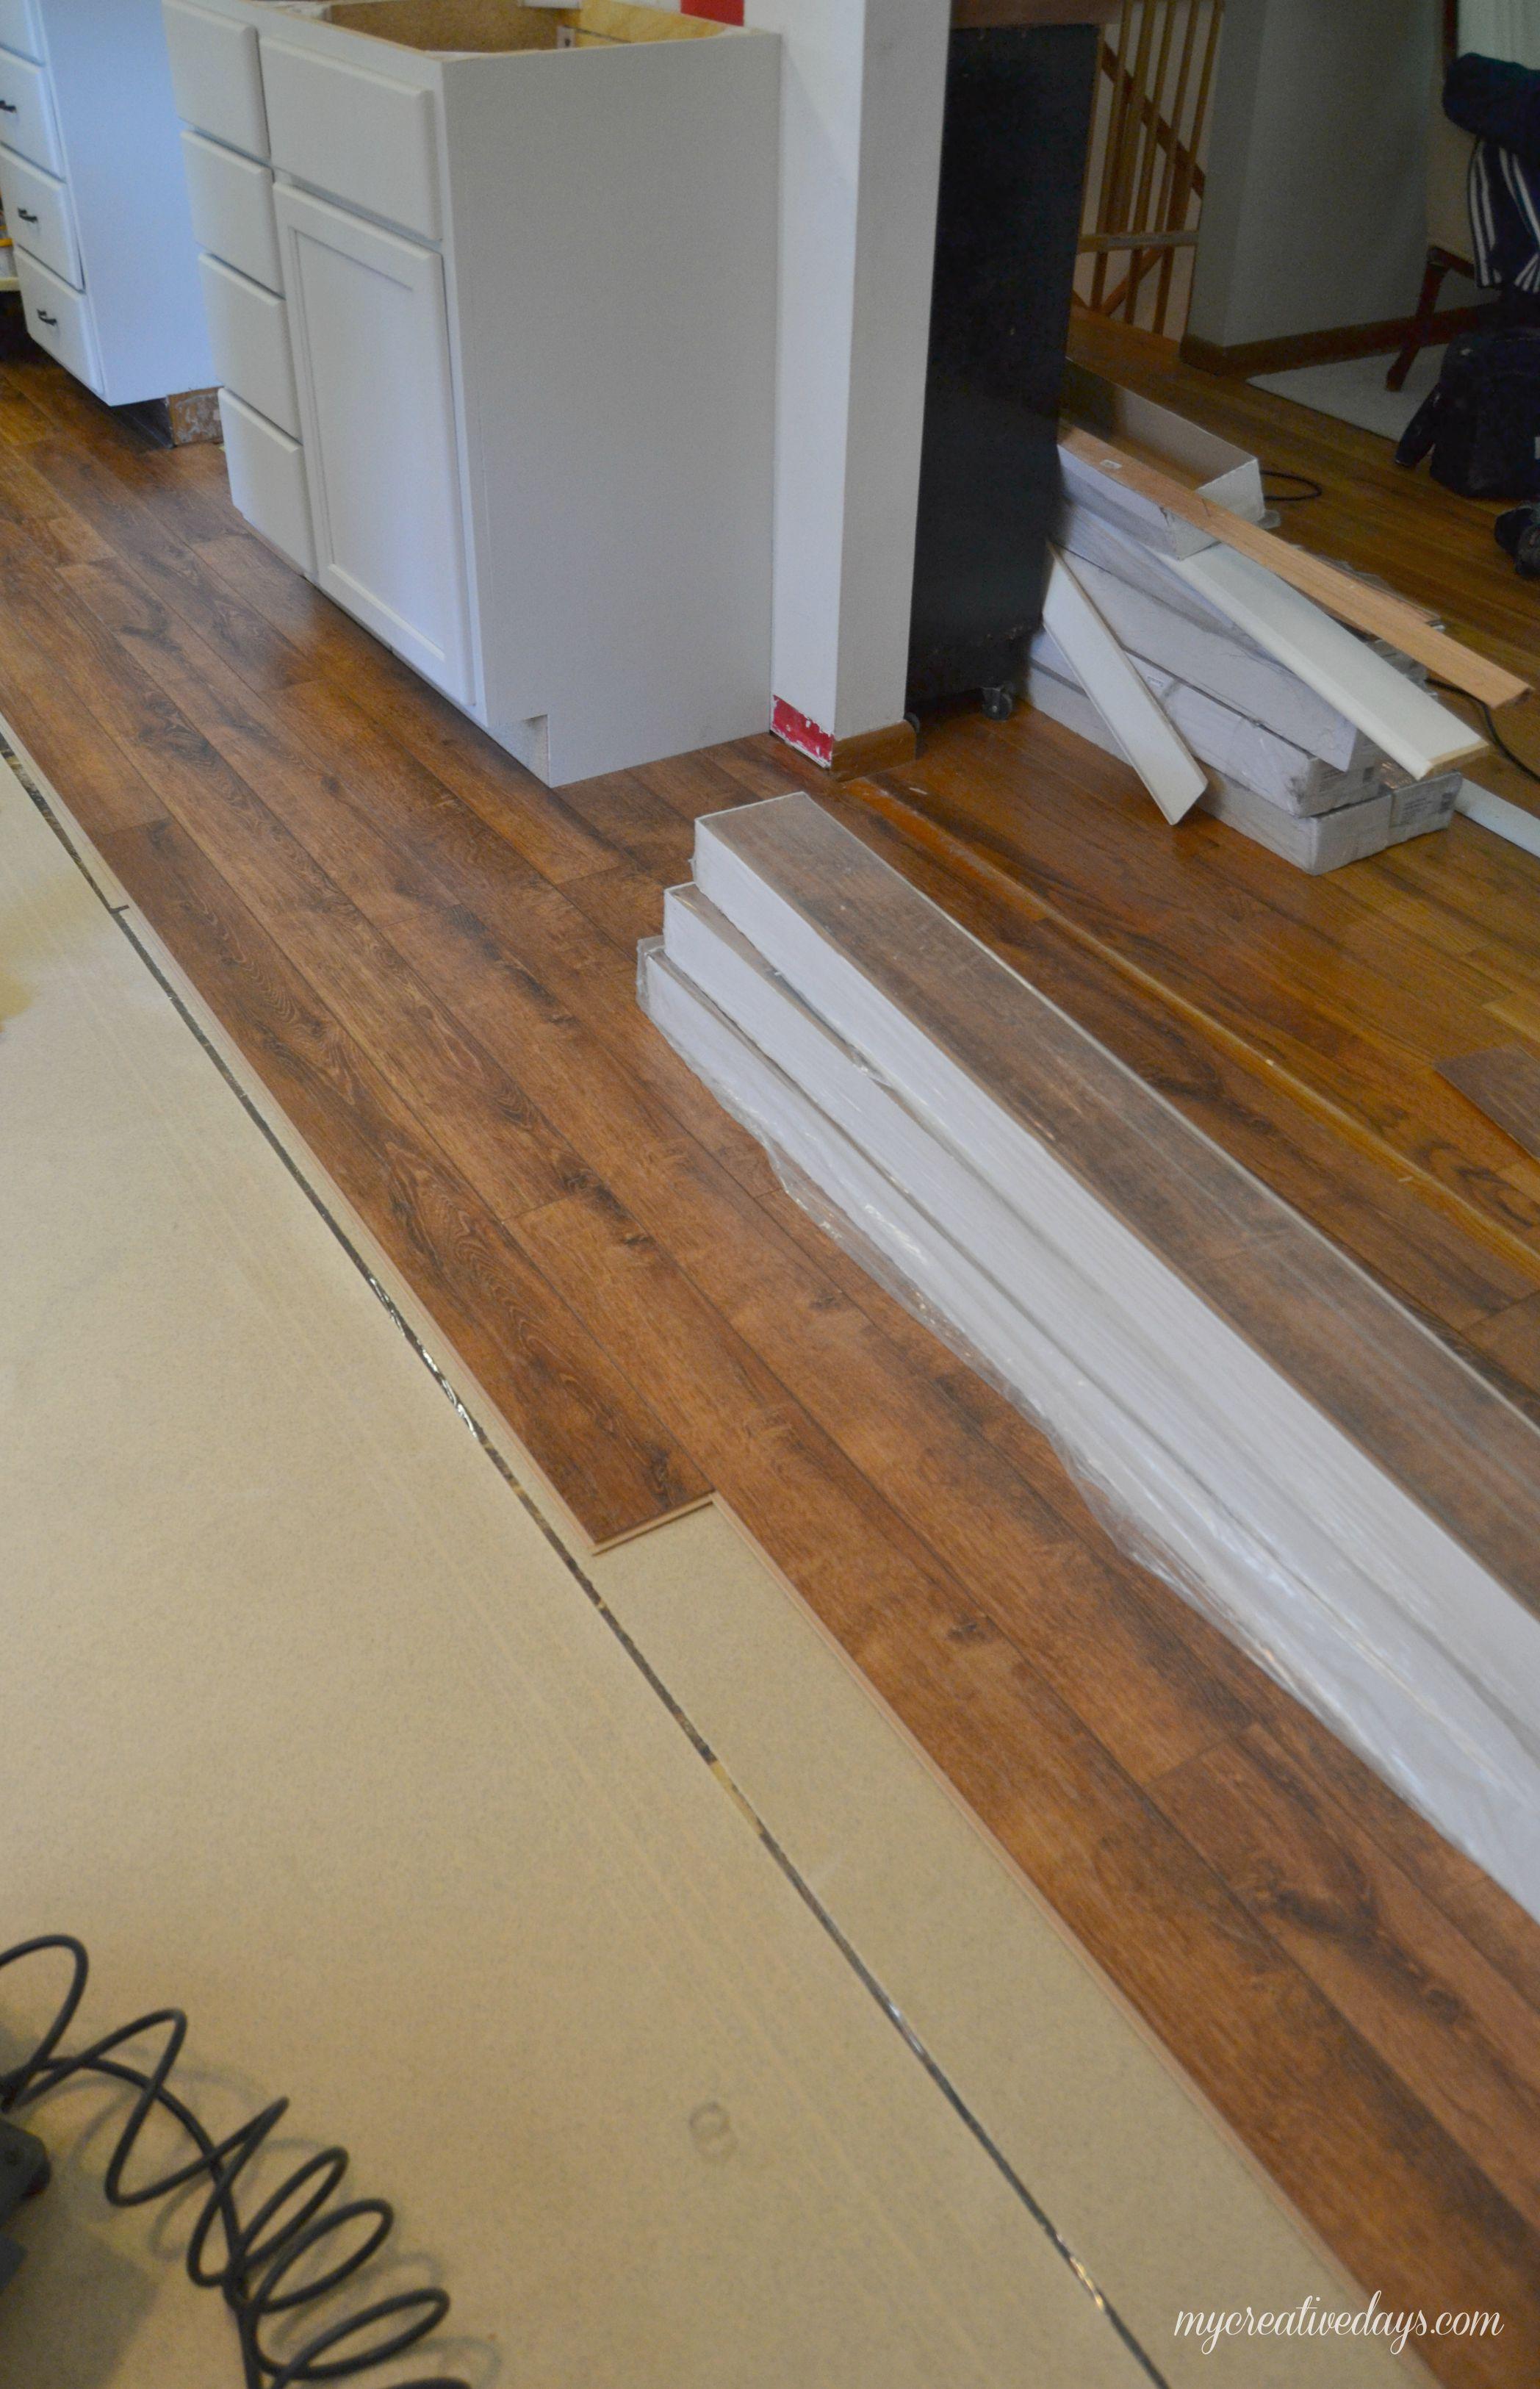 How To Install Laminate Flooring, Laminate Wood Flooring Calculator